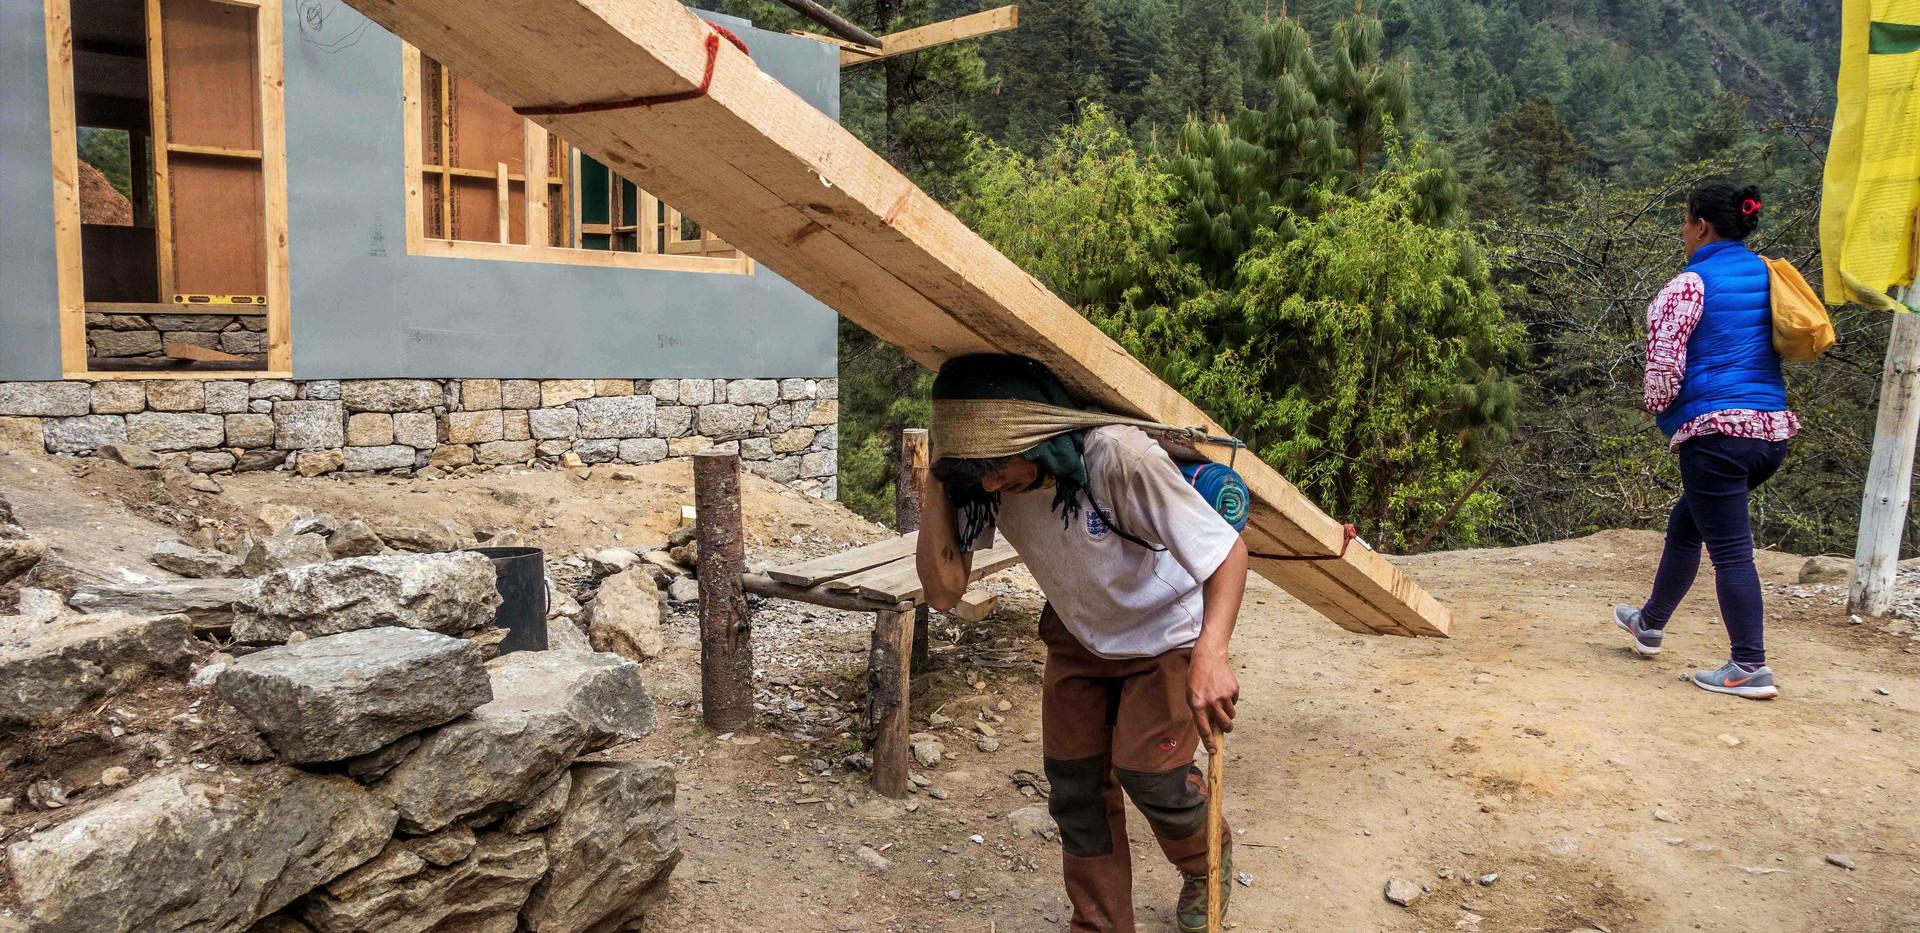 Nepal-2019-077- Khumbu Trek.jpg